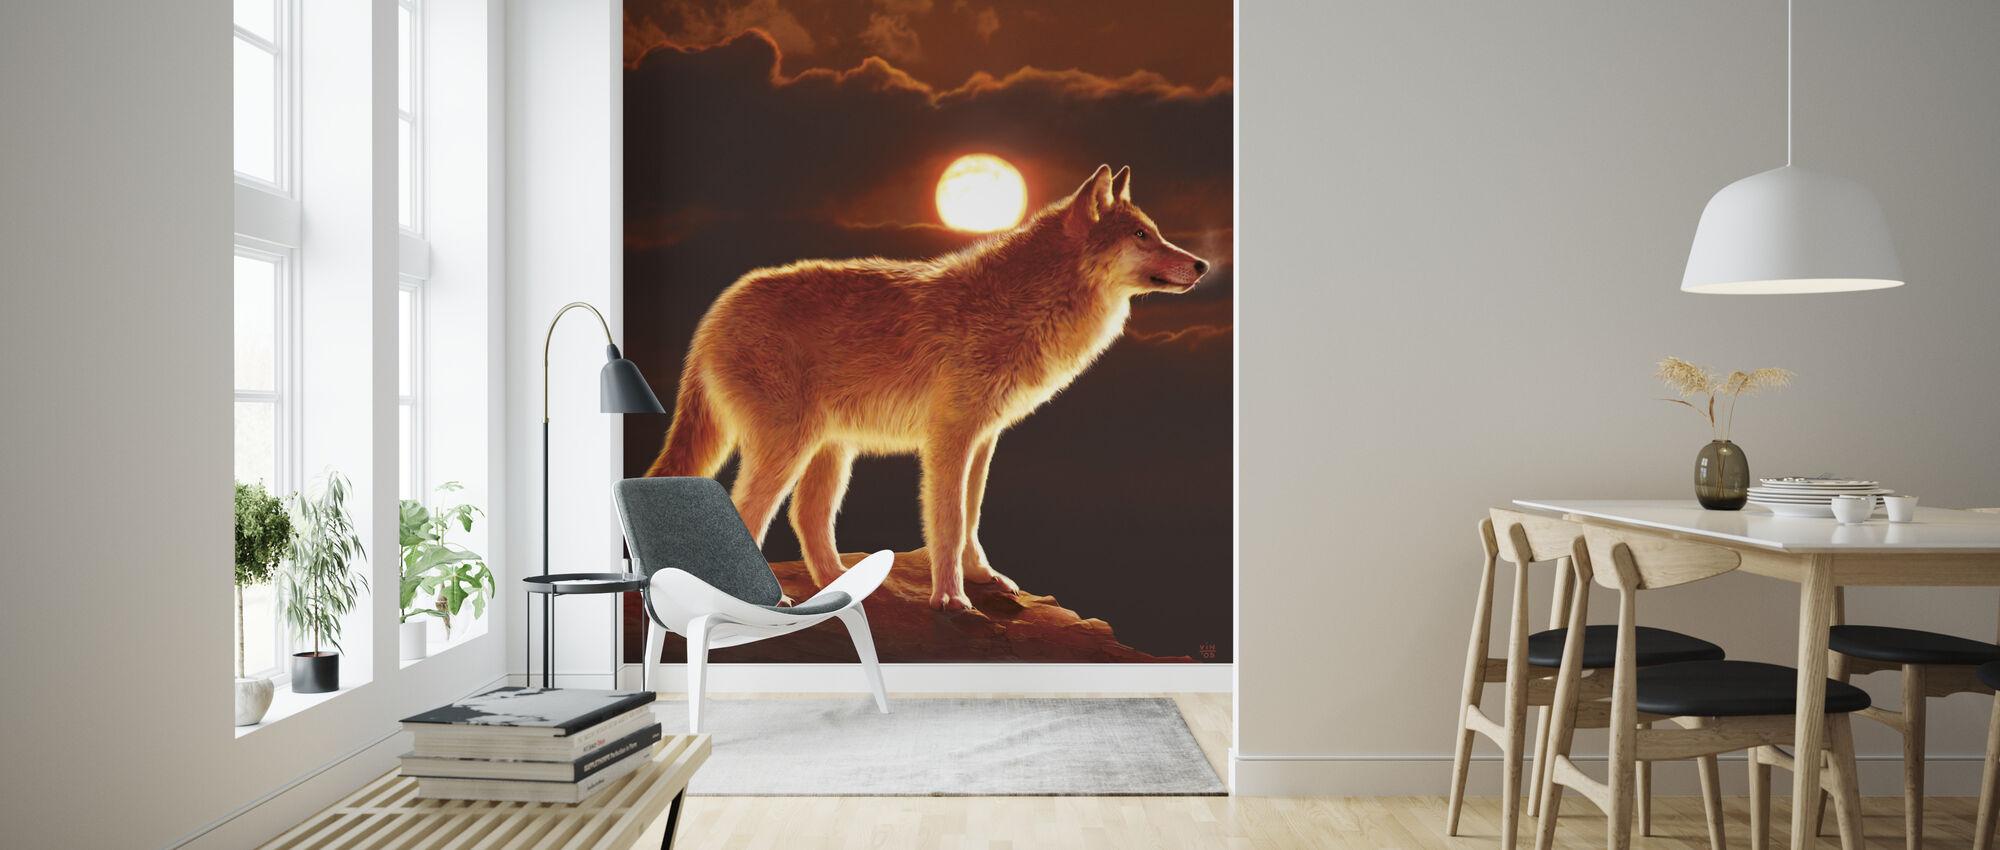 Solnedgang ulv - Tapet - Stue